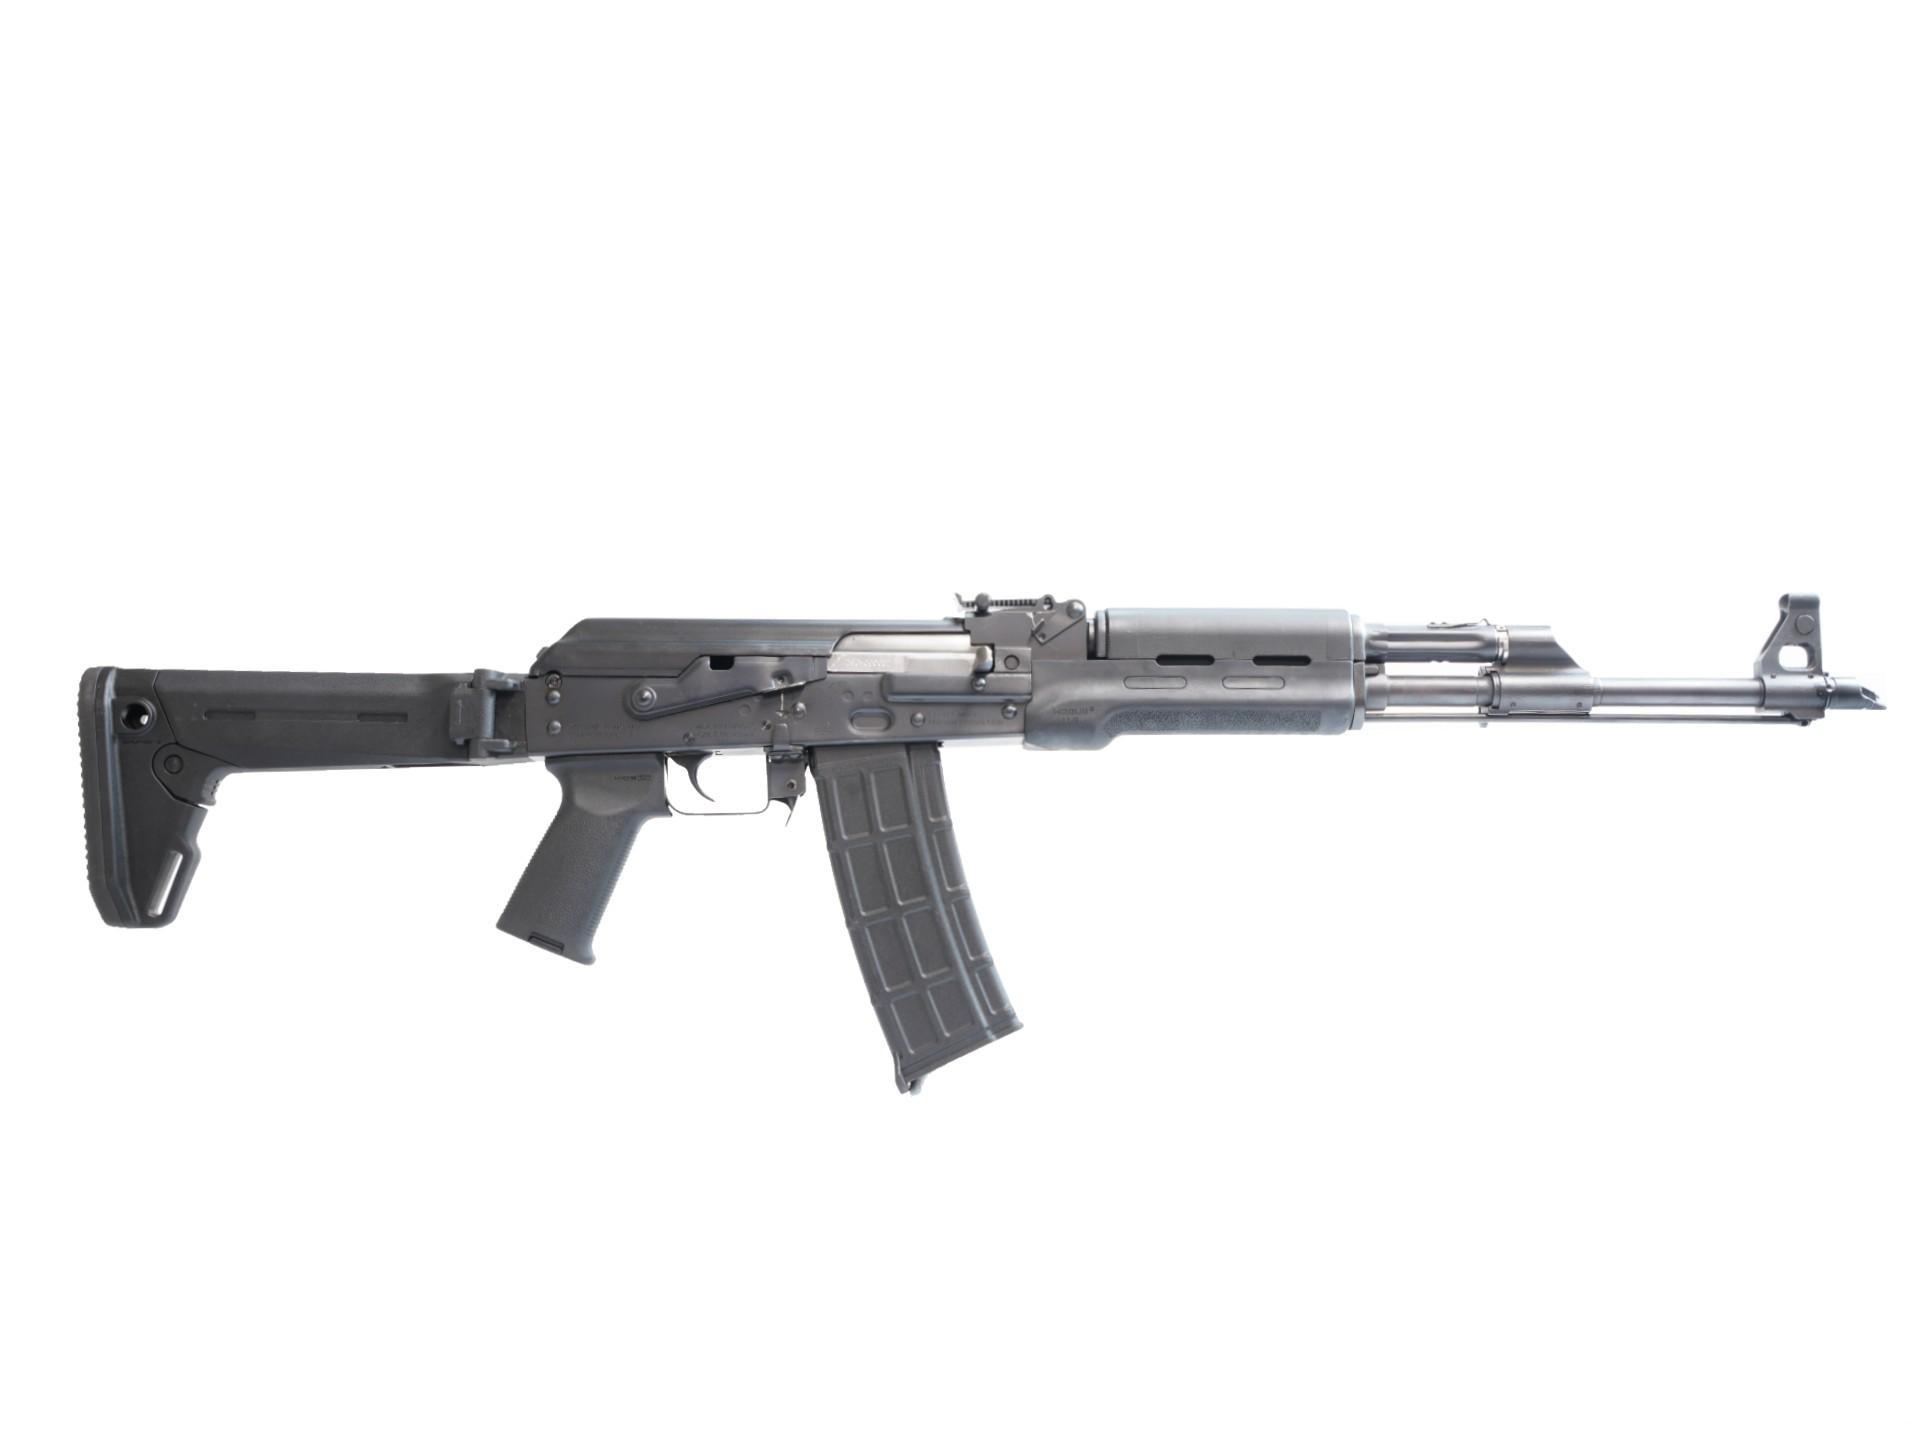 Zastava Arms USA PAP M90 5.56 X 45MM